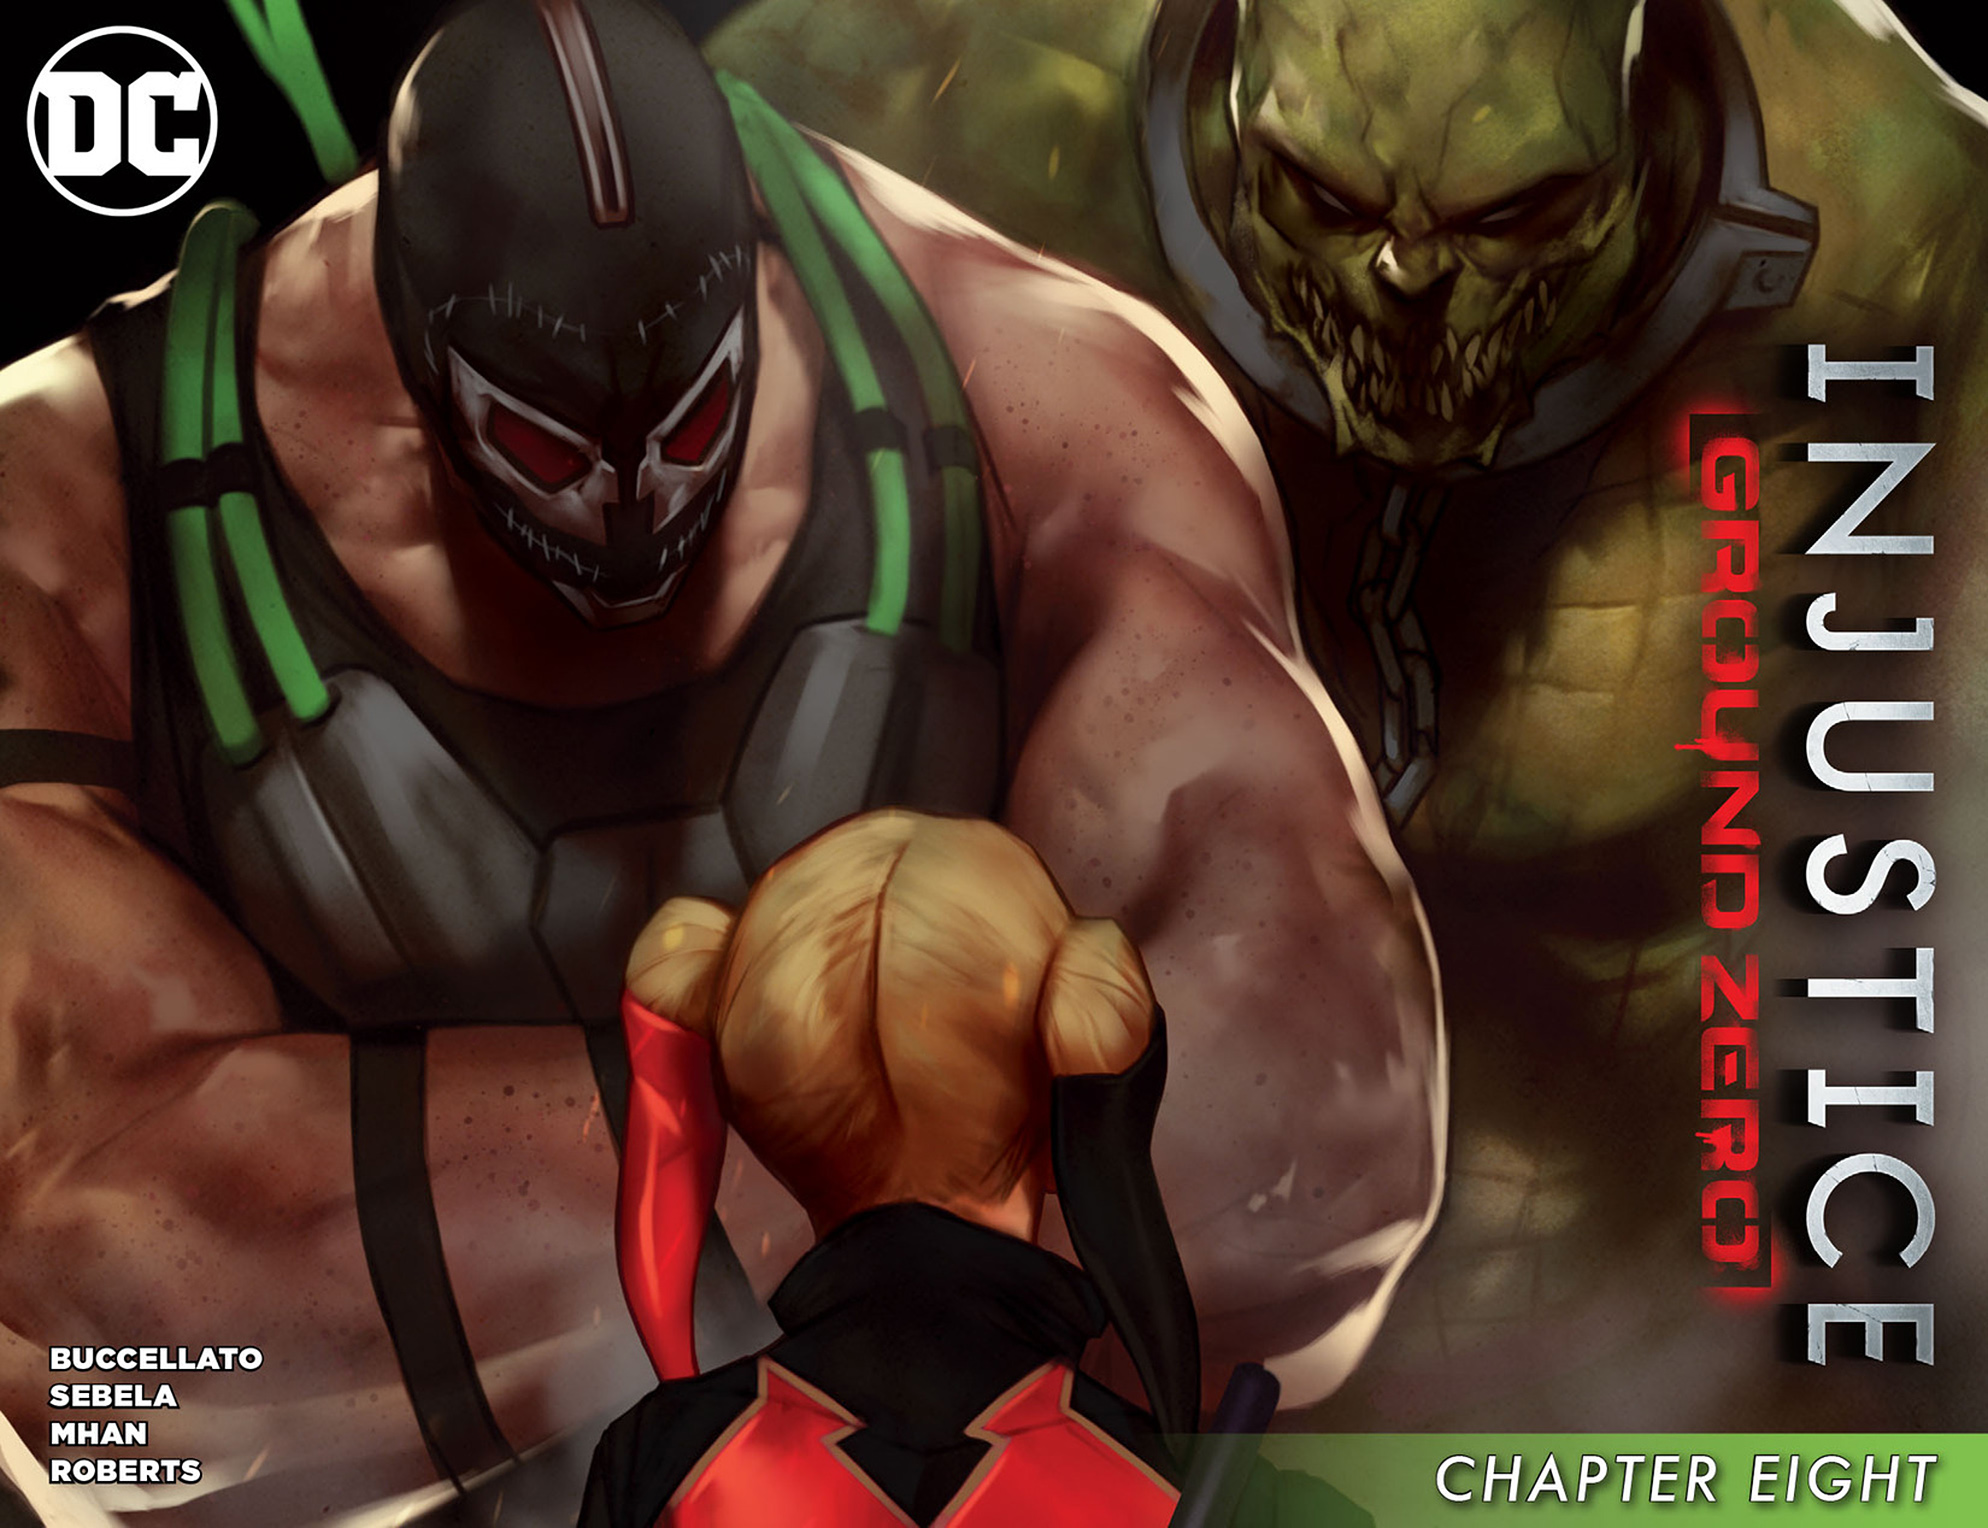 Read online Injustice: Ground Zero comic -  Issue #8 - 1